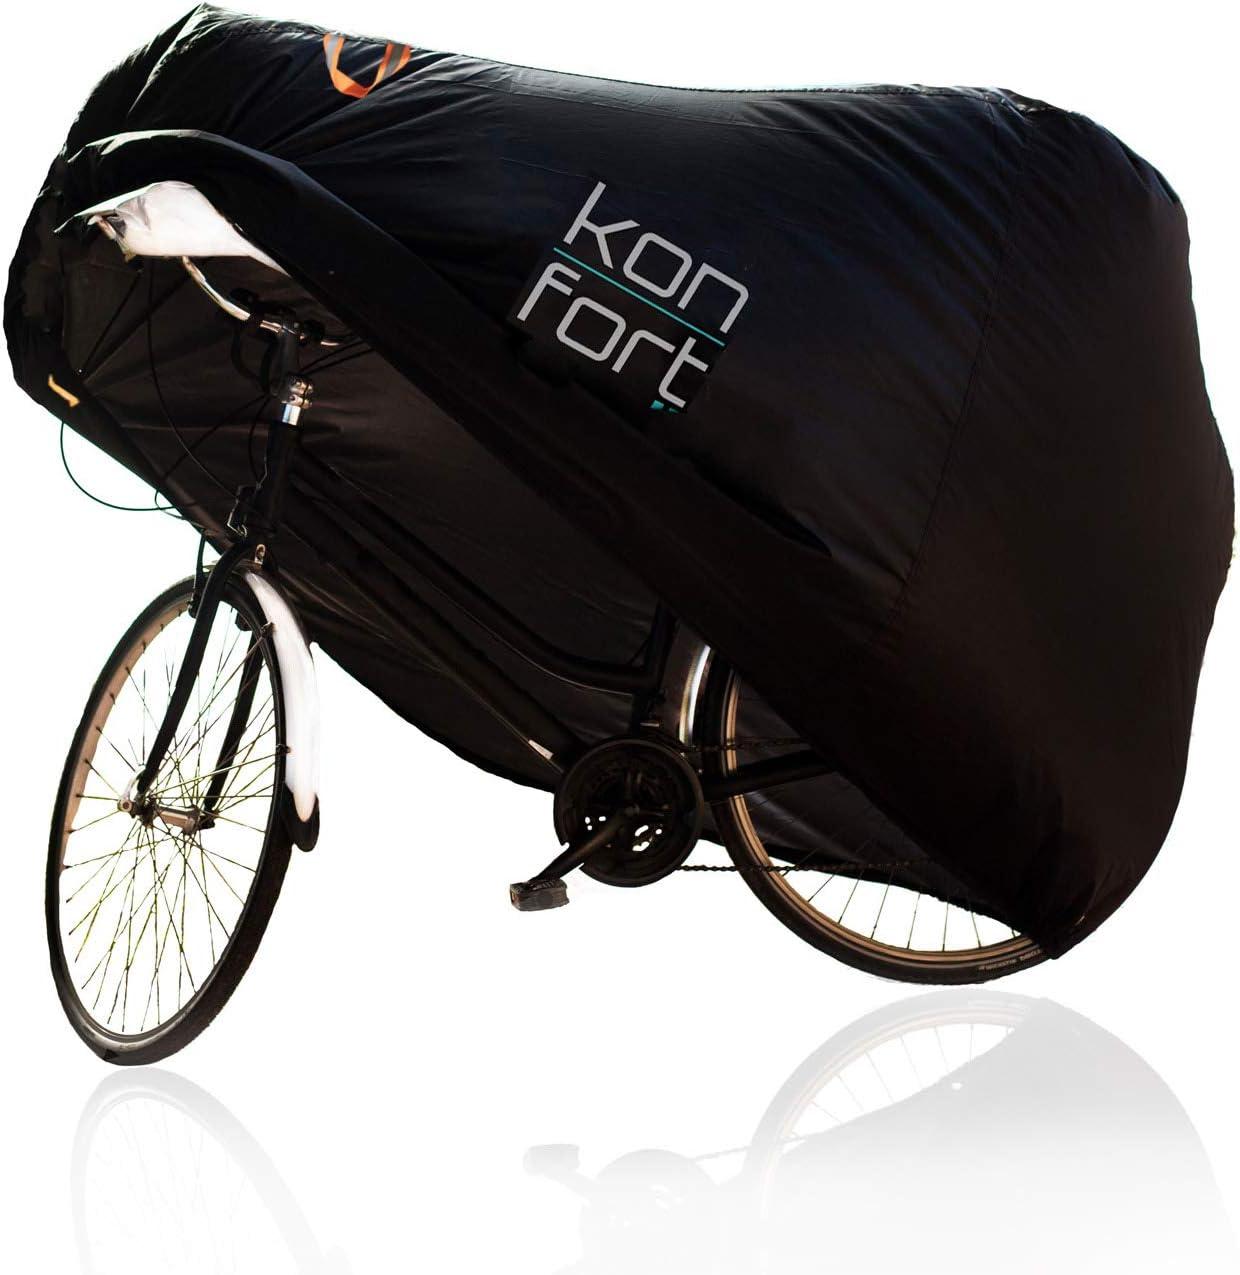 KON-FORT Funda Bicicleta Exterior Impermeable Tela Oxford 210D, contra Lluvia Sol Polvo, para Montaña Carretera (1-2 bicis) con Bolsa de Transporte y Candado y Cable antirrobo